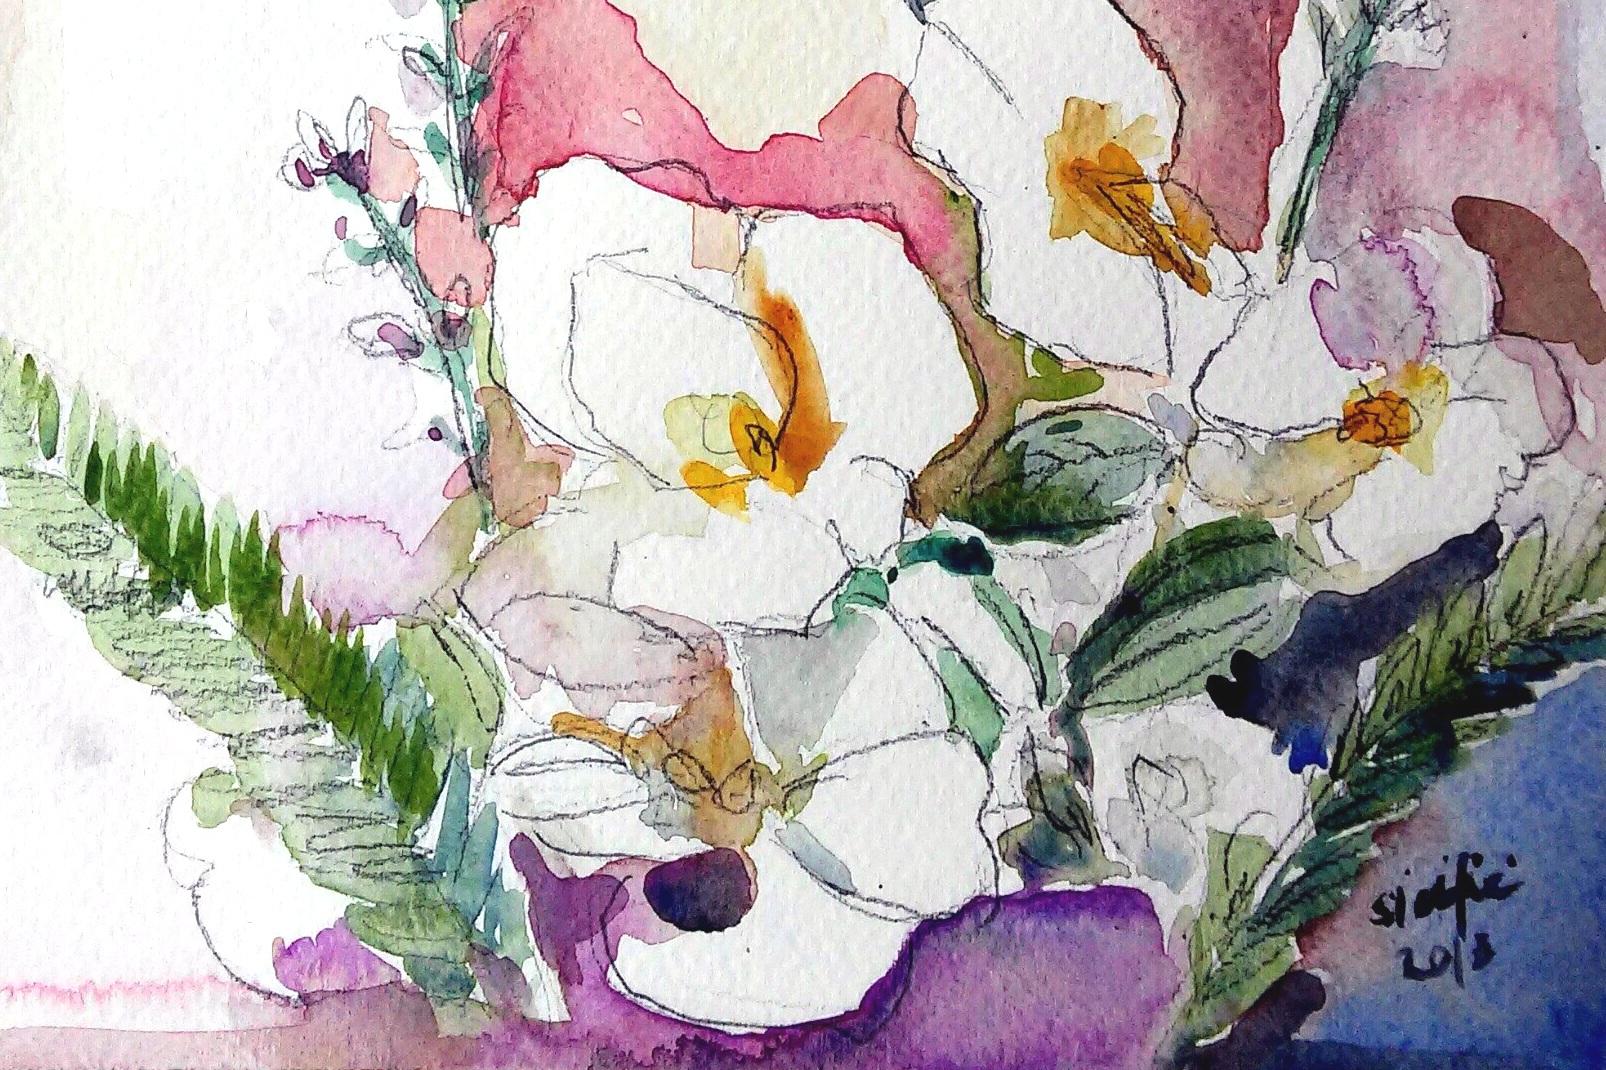 Painting: Siettie